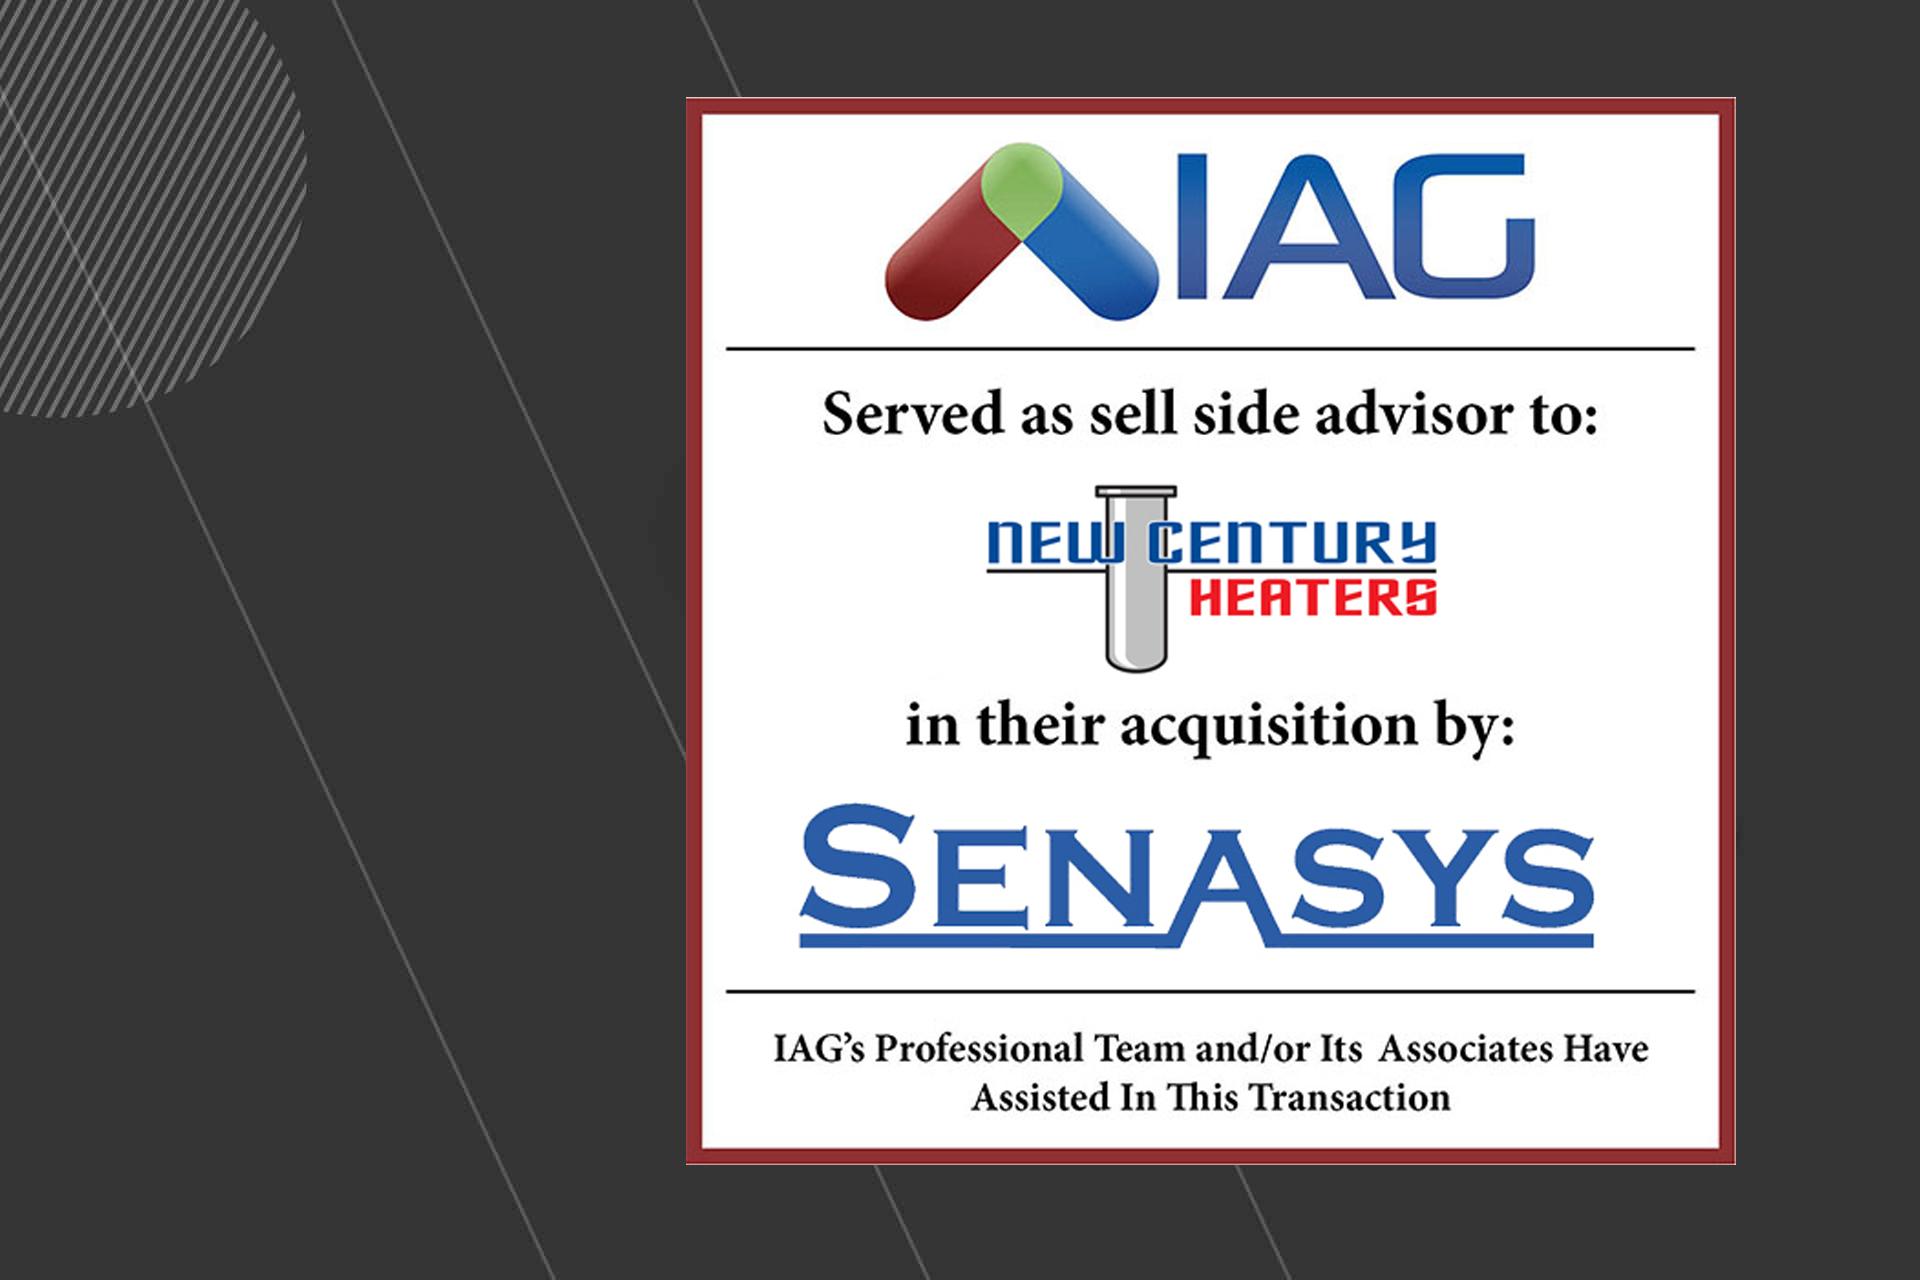 iag sells new century heaters